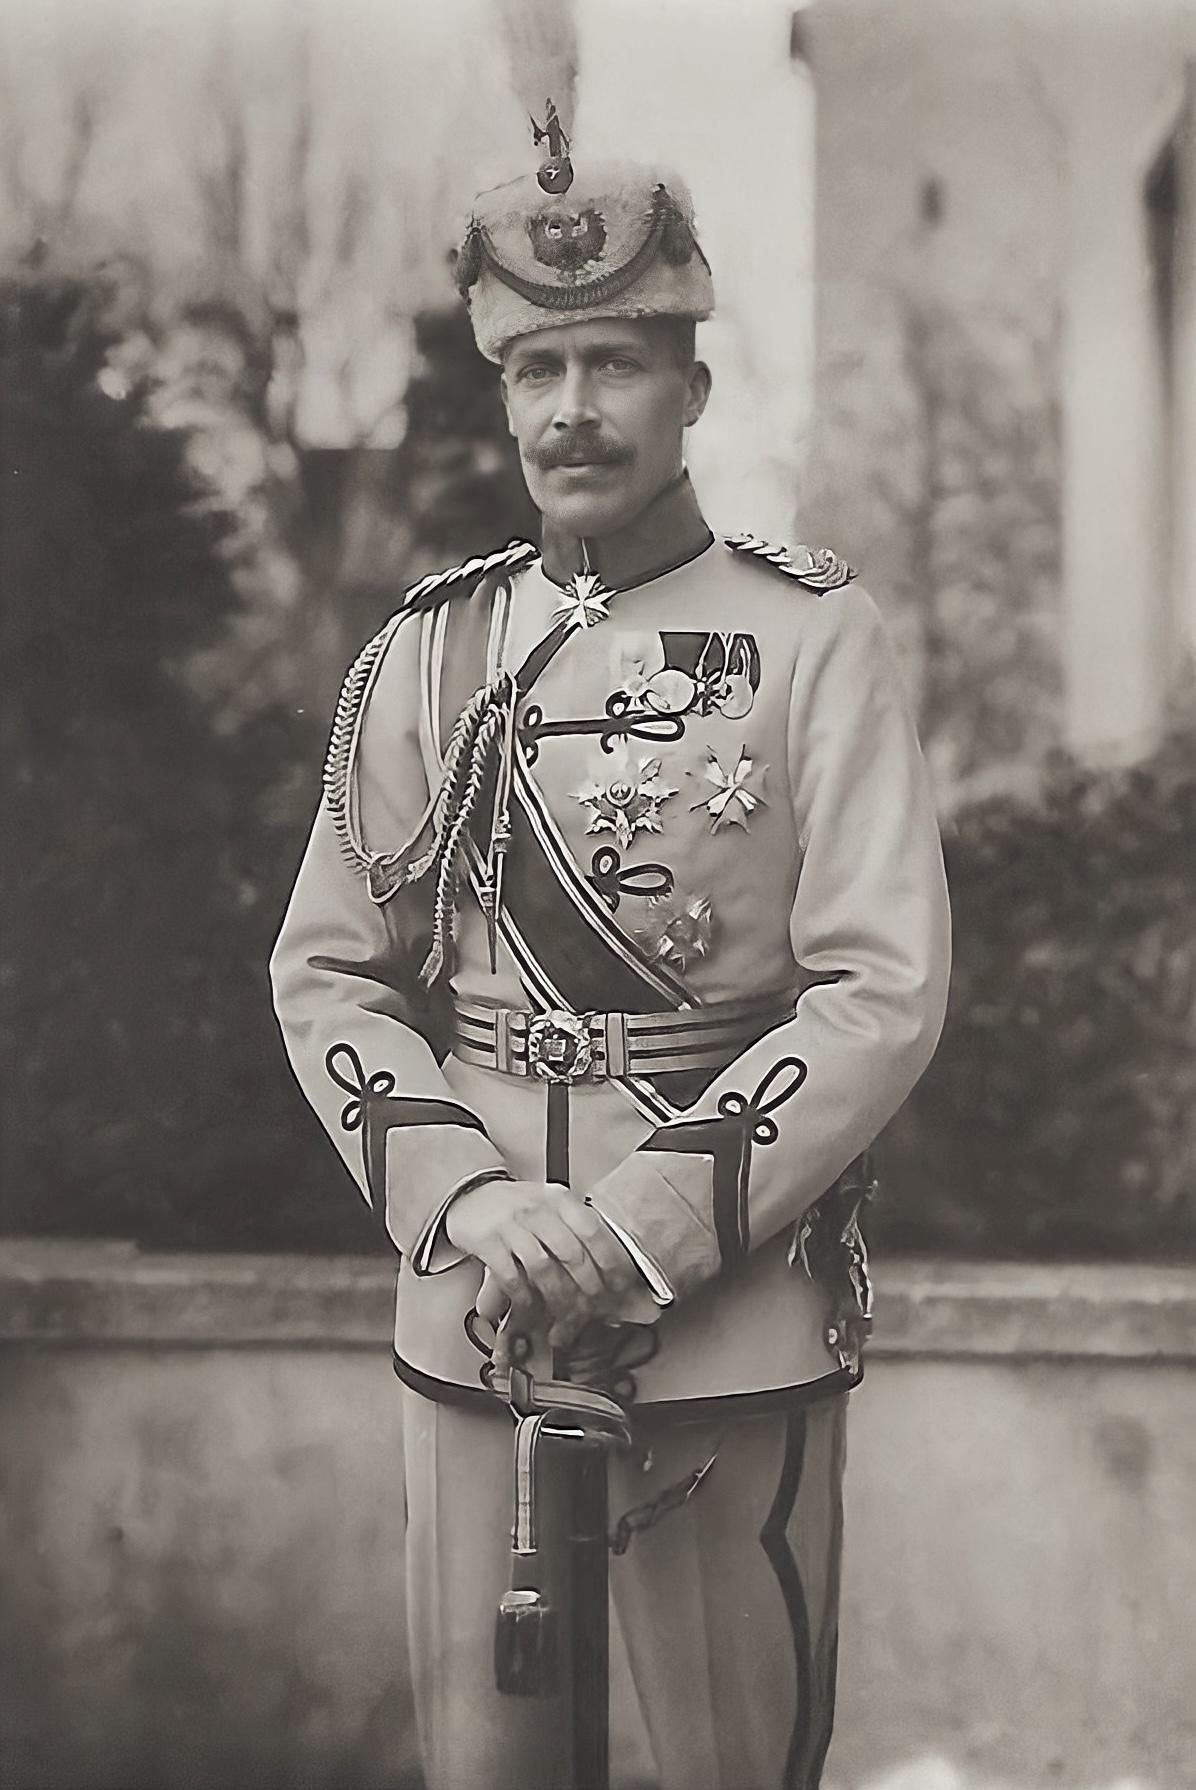 Wilhelm_zu_Wied_1912_a.jpg